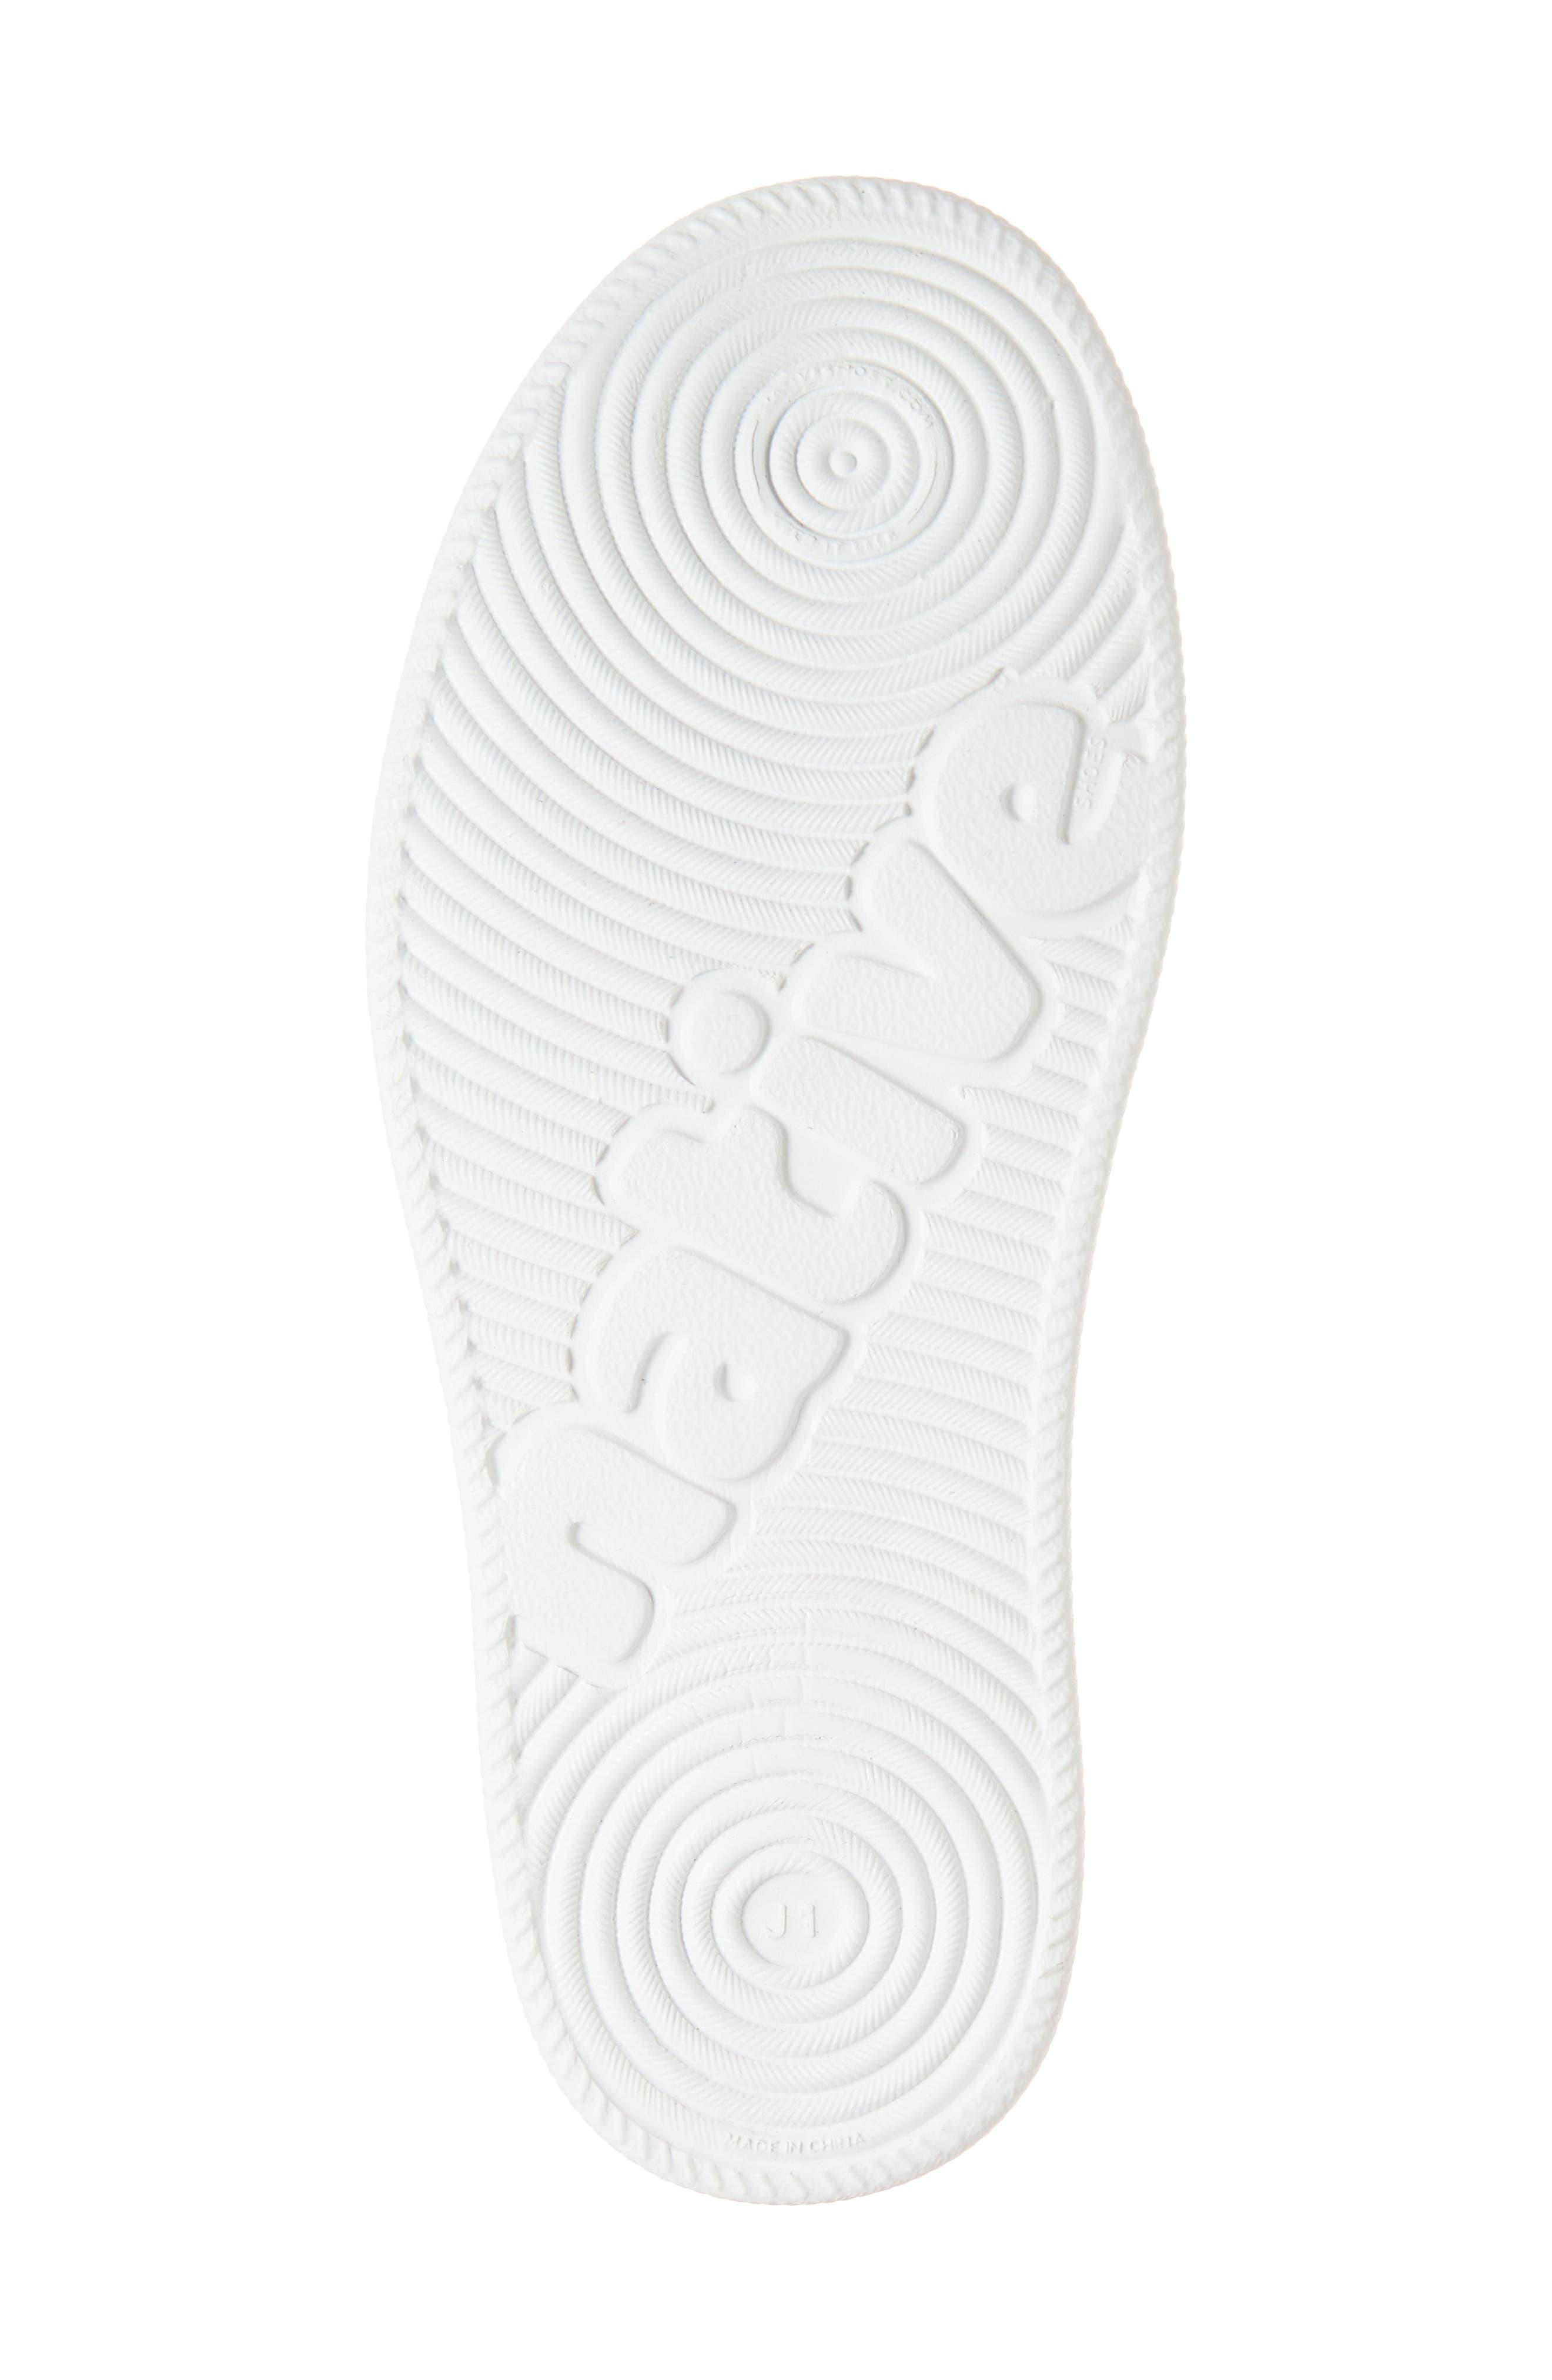 Verona Junior Perforated Slip-On,                             Alternate thumbnail 6, color,                             414